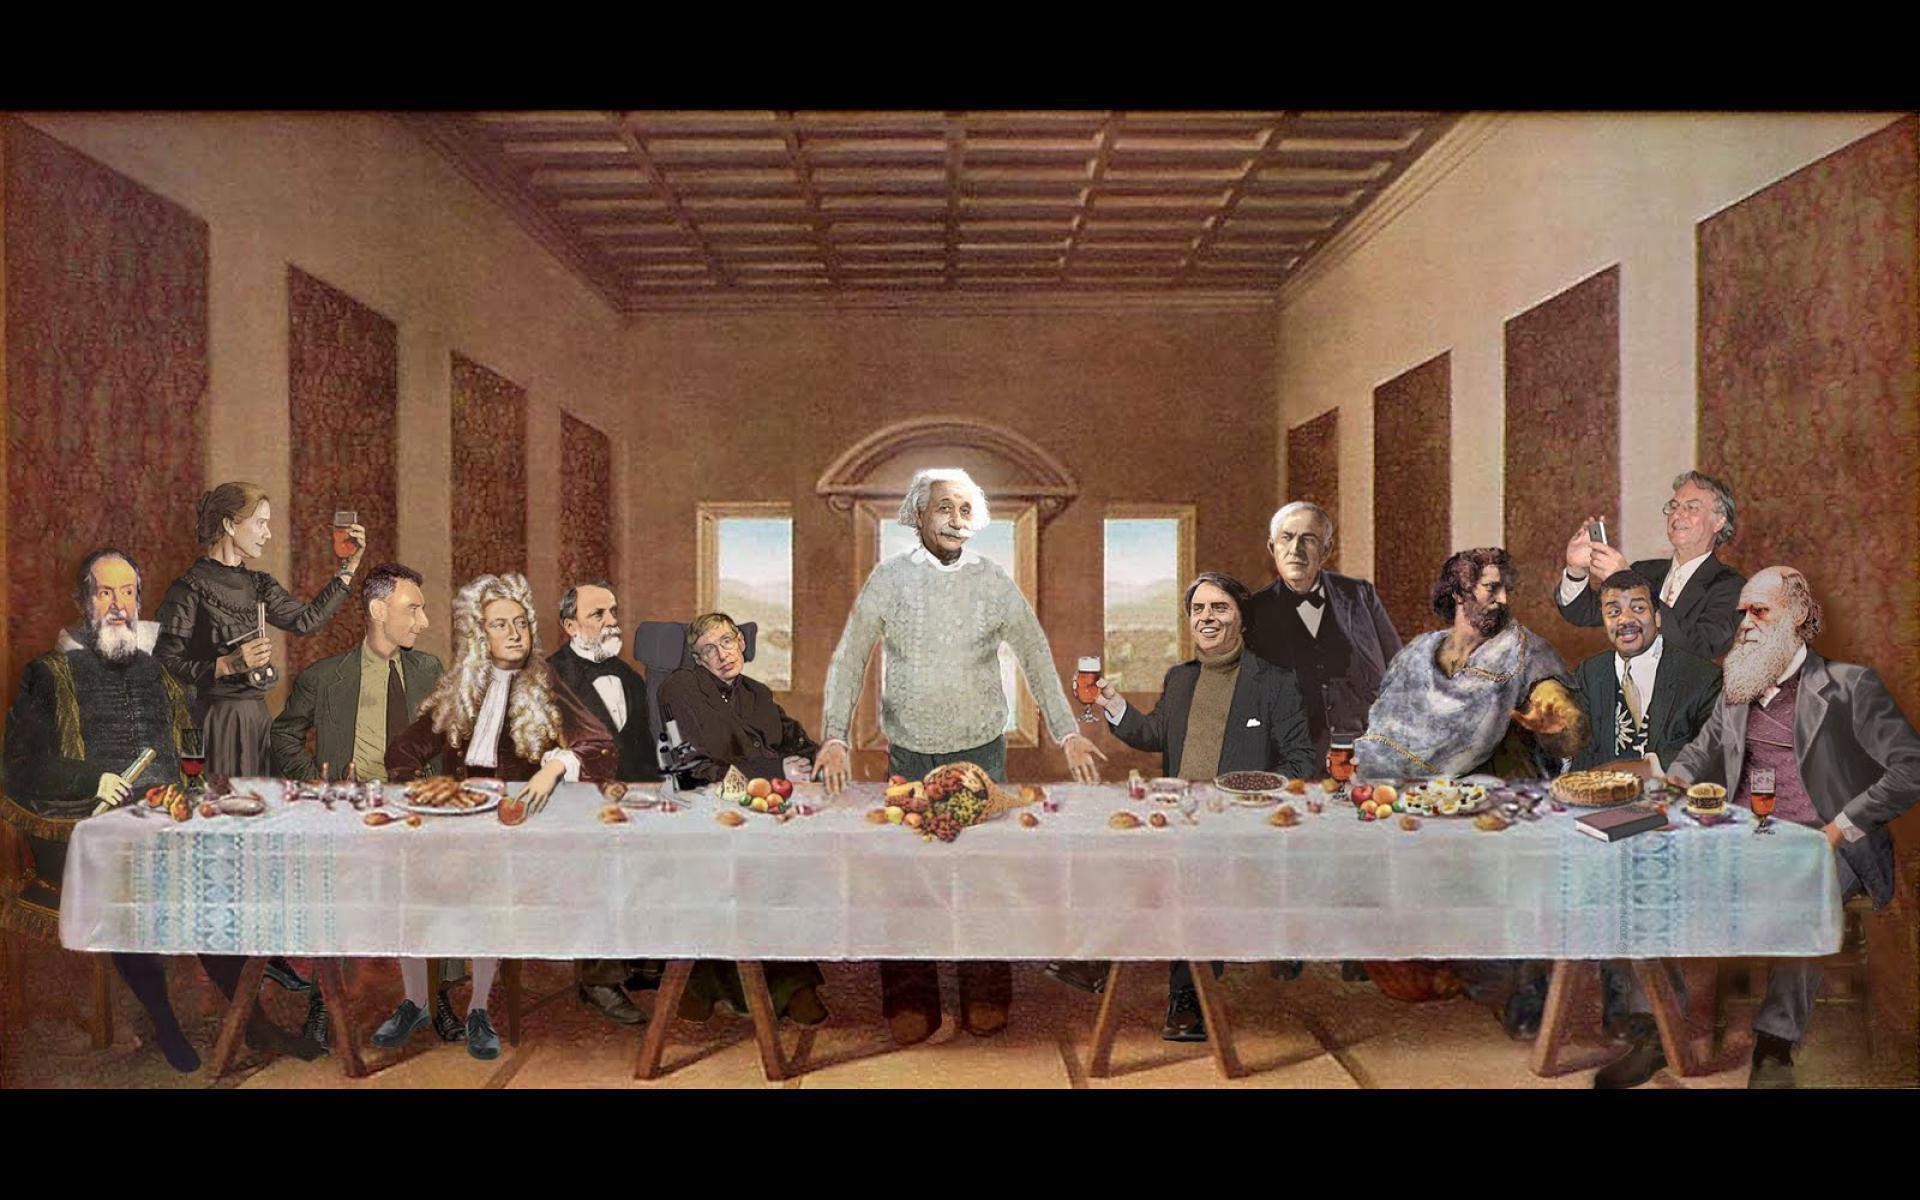 The Last Supper Wallpapers - Wallpaper Cave Da Vinci Last Supper High Resolution